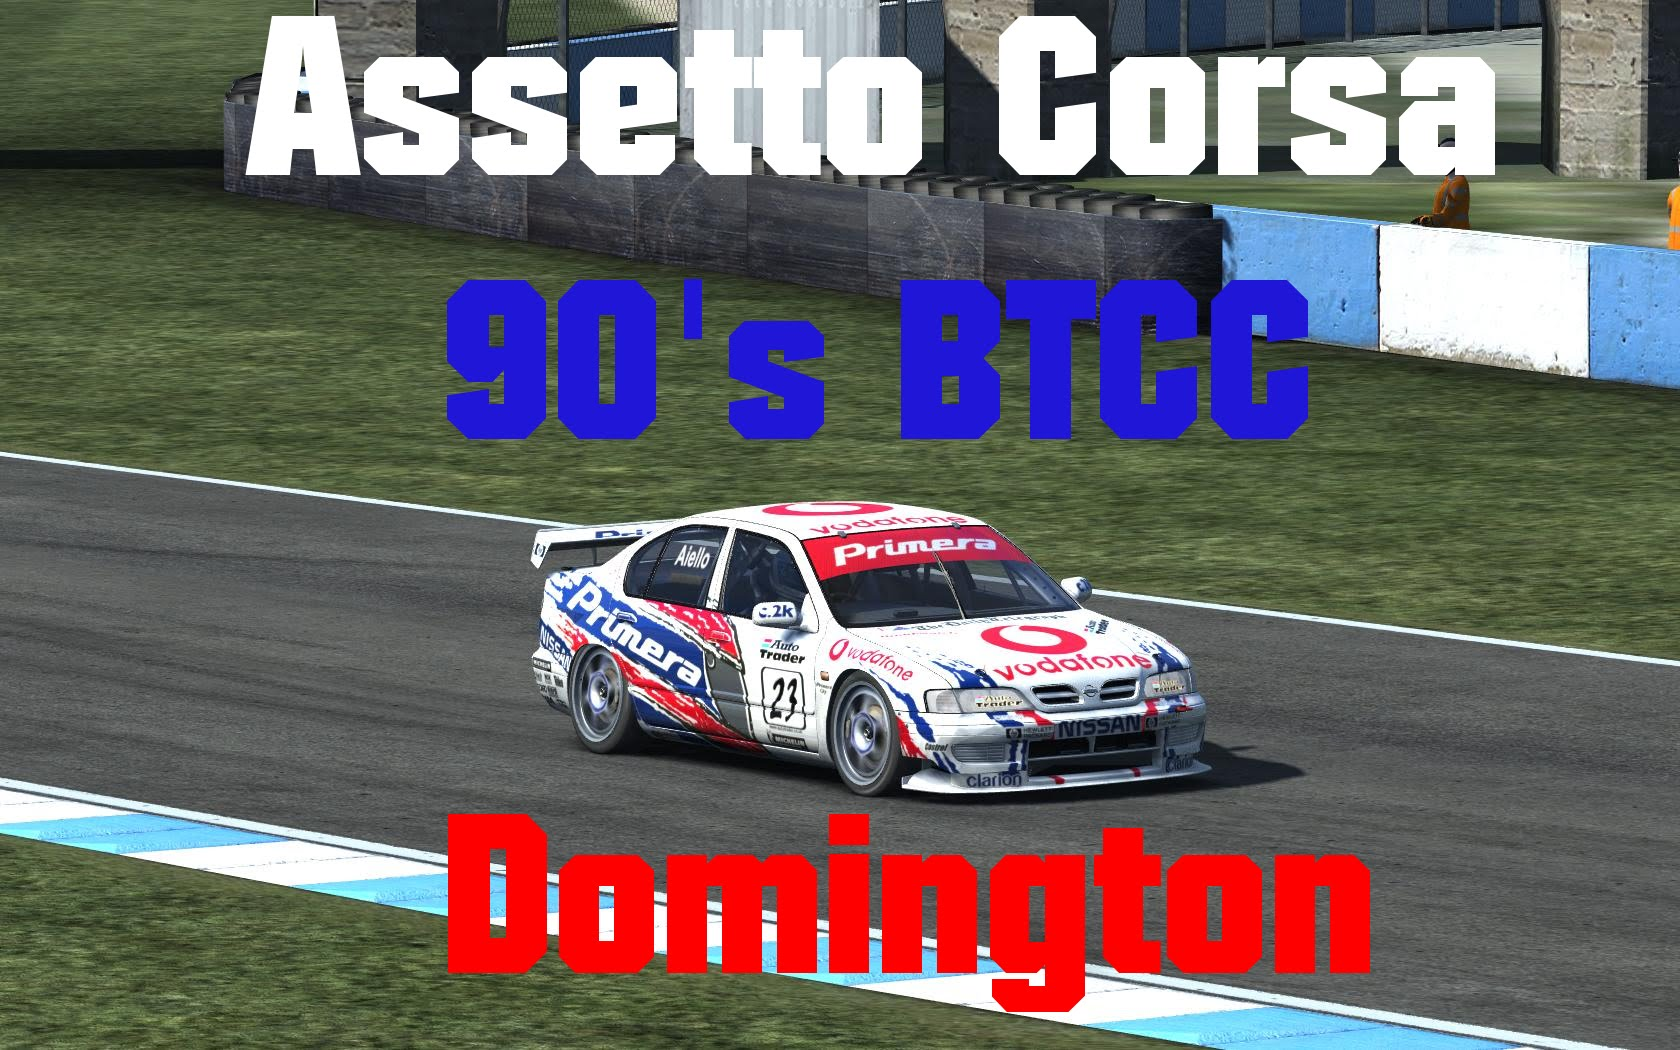 Assetto Corsa // 90's BTCC  // Mod // Vauxhall cavalier 1990 + Nissan Primera 1999